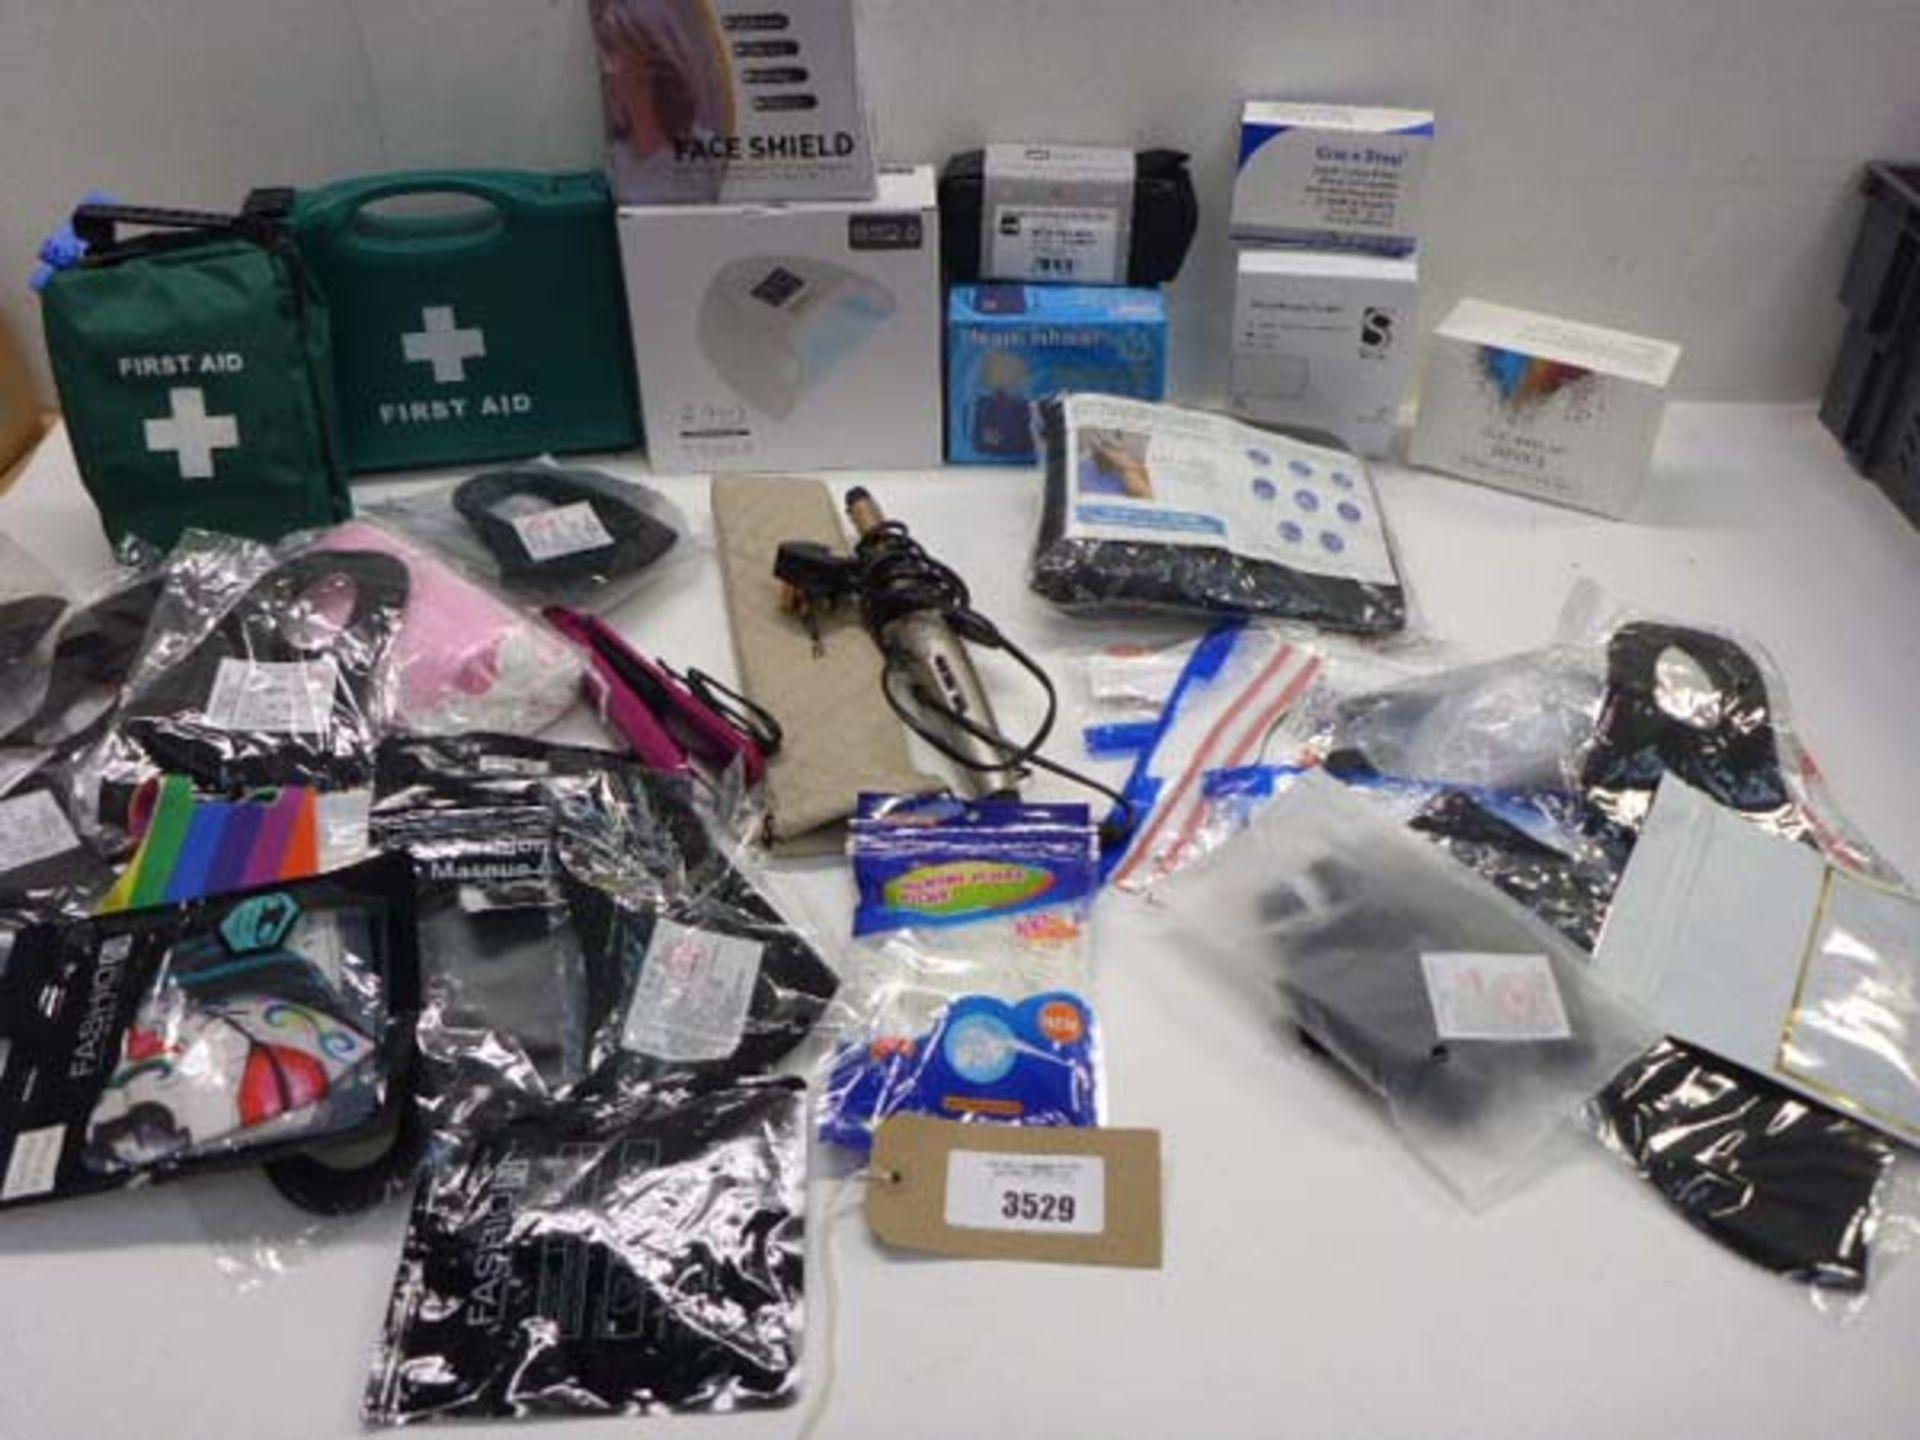 First Aid kits, Nail lamp. Steam inhaler, neck hammock, Remington hair styler, Electronic